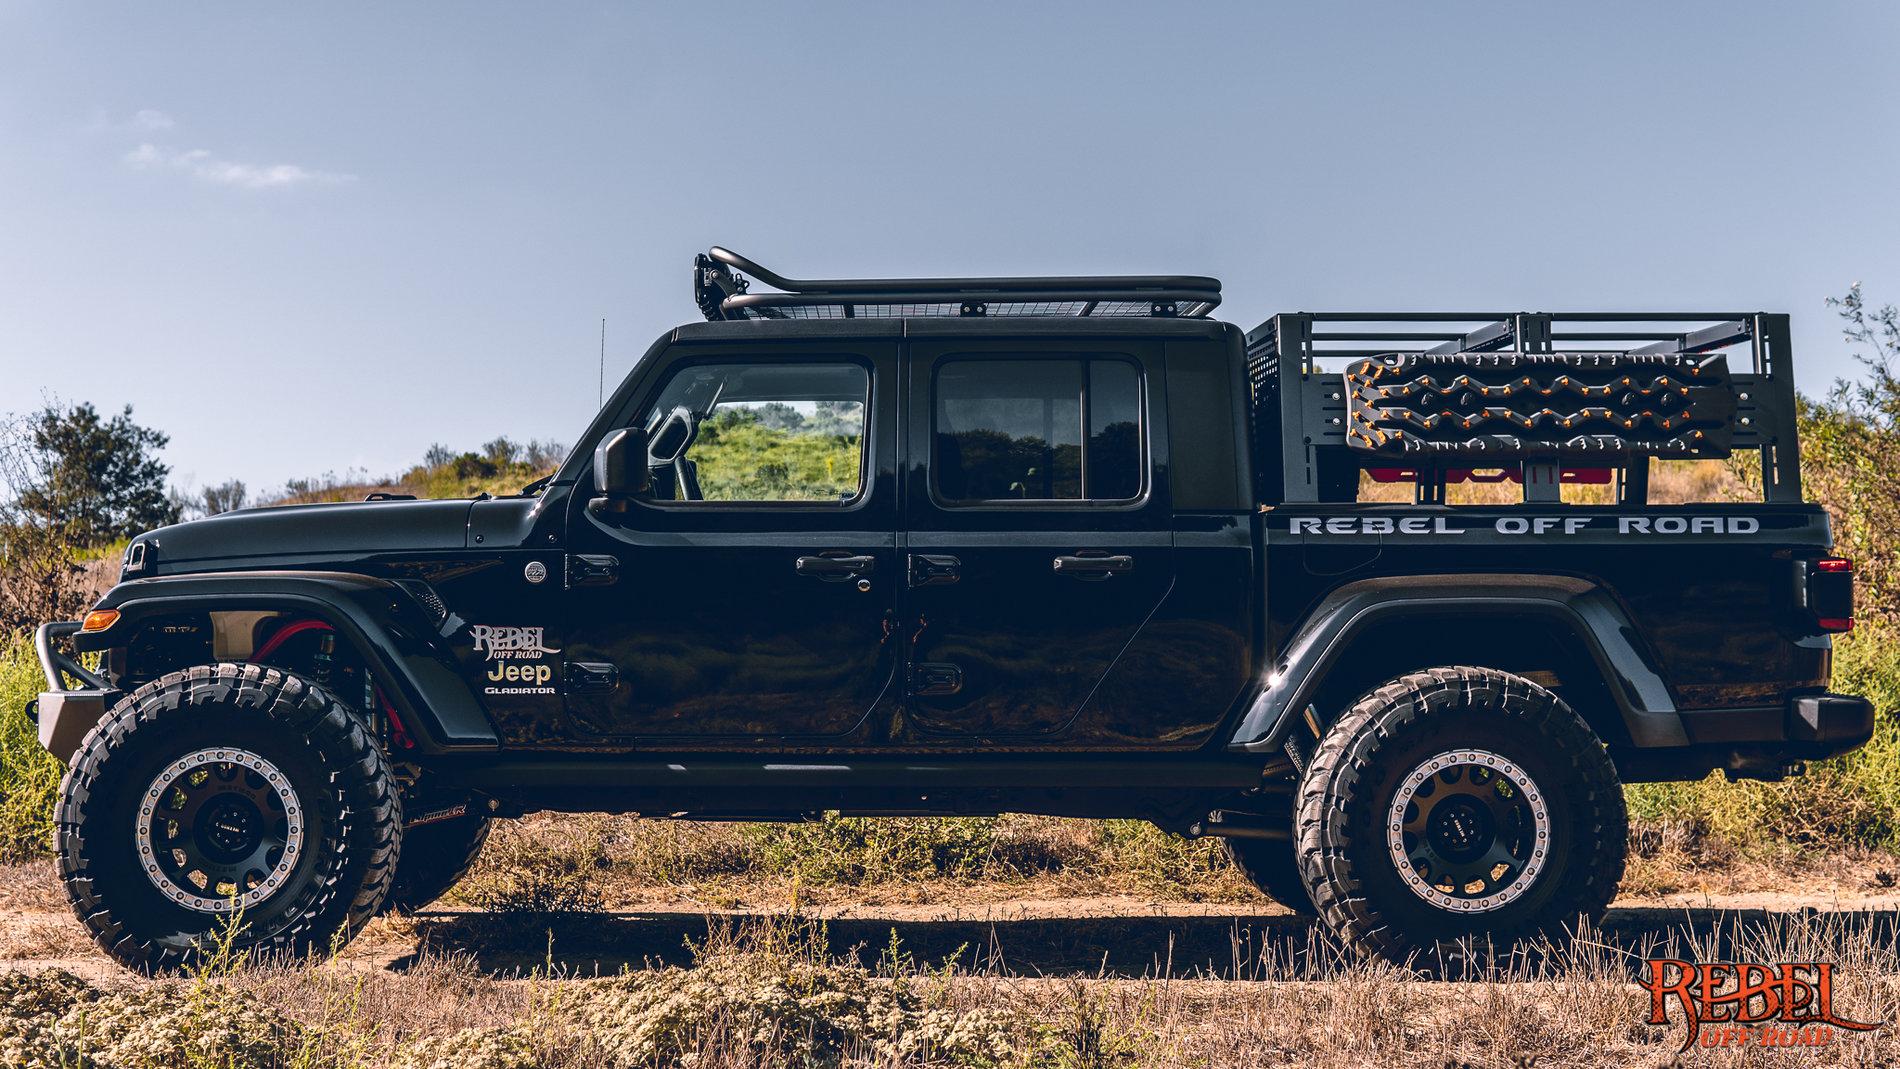 Jeep Wrangler Kayak Rack >> XPLOR Full & Half Jeep Gladiator Bed Racks - REBEL OFF ROAD